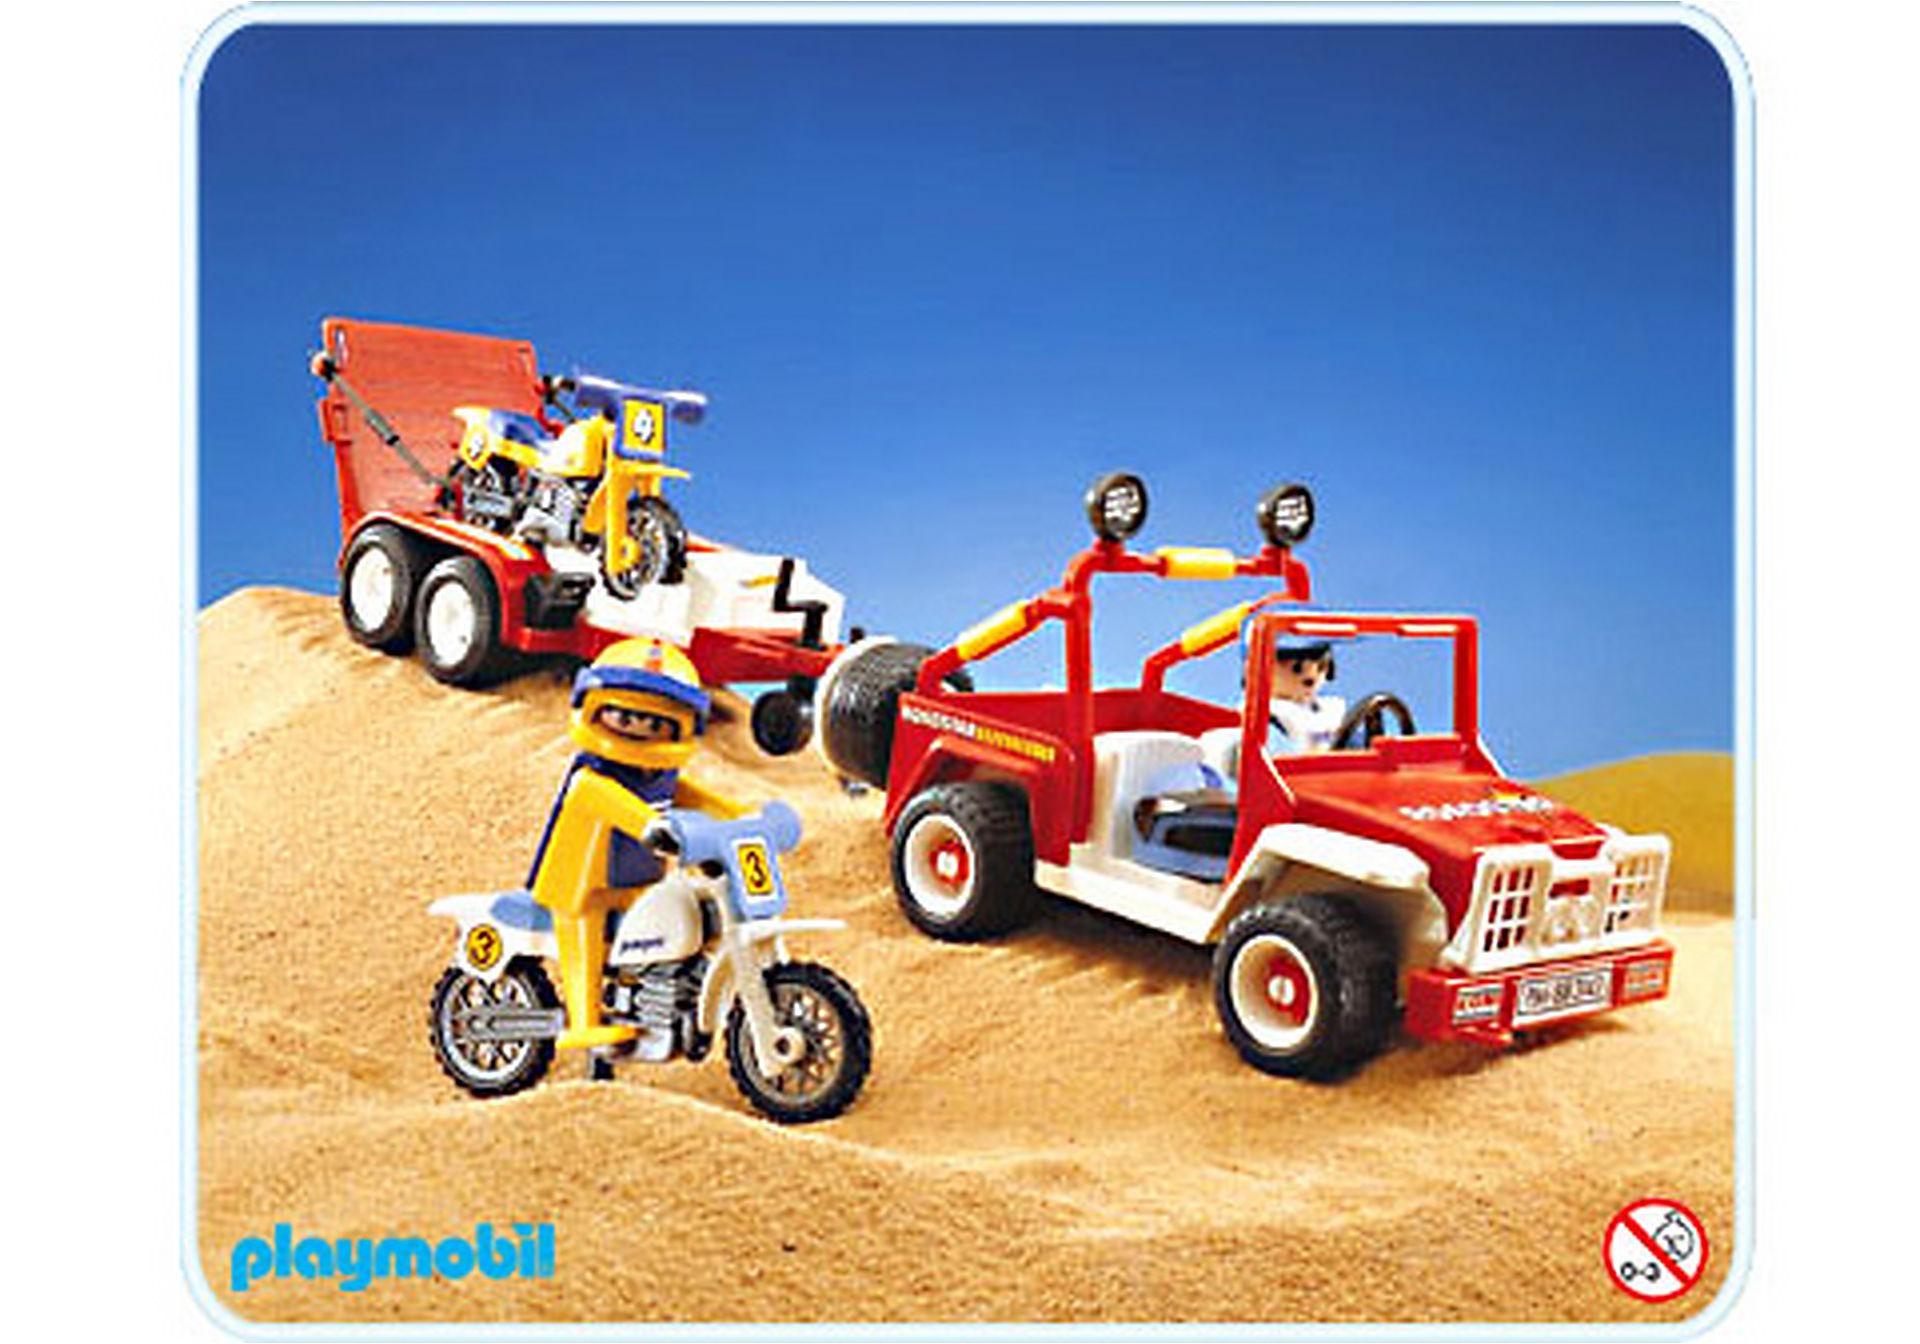 http://media.playmobil.com/i/playmobil/3143-A_product_detail/Voiture tout terrain + moto cross